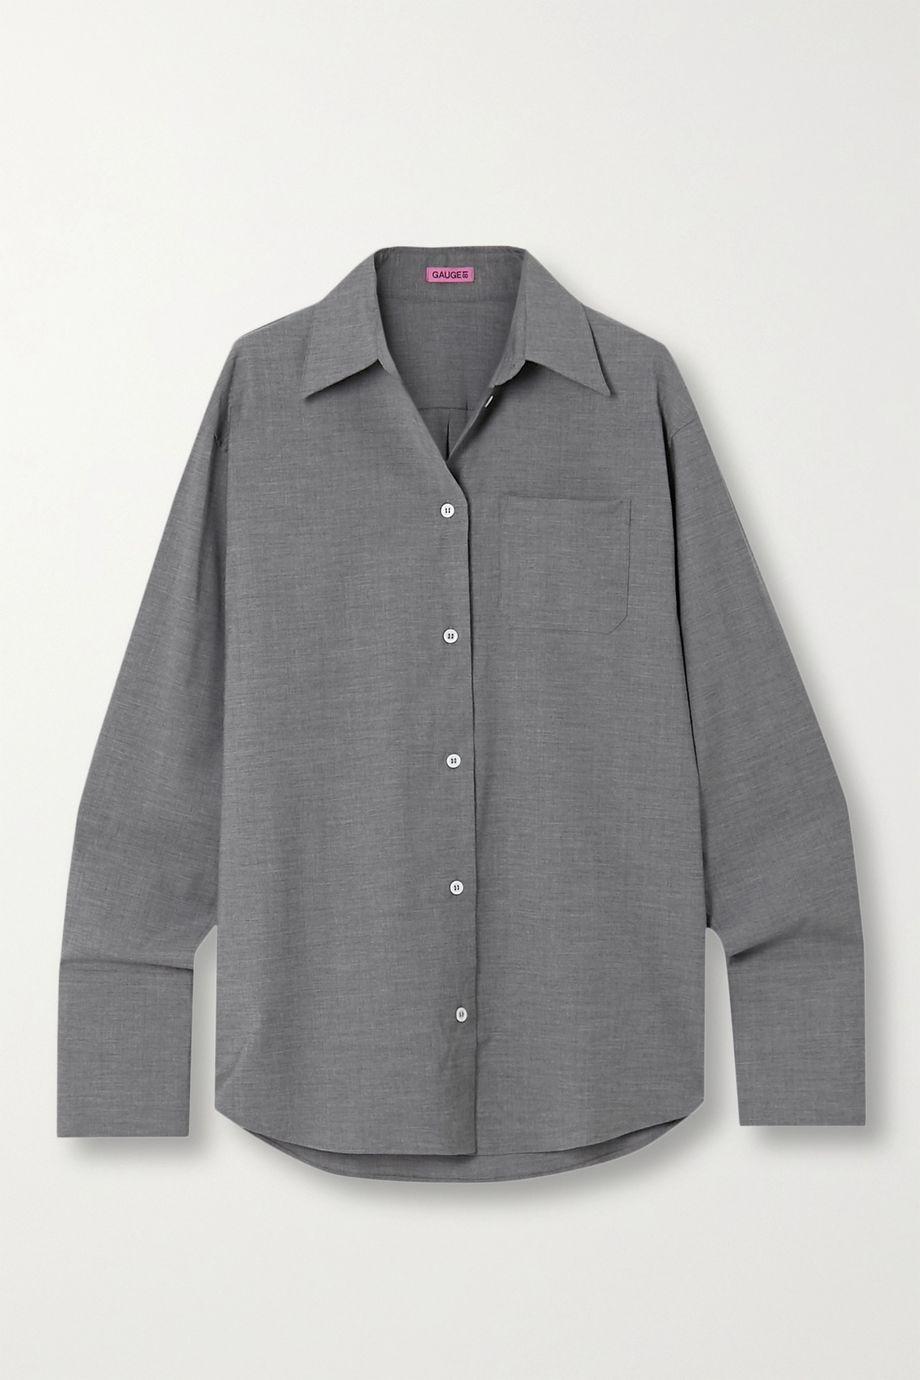 GAUGE81 Lowly oversized stretch wool-blend shirt